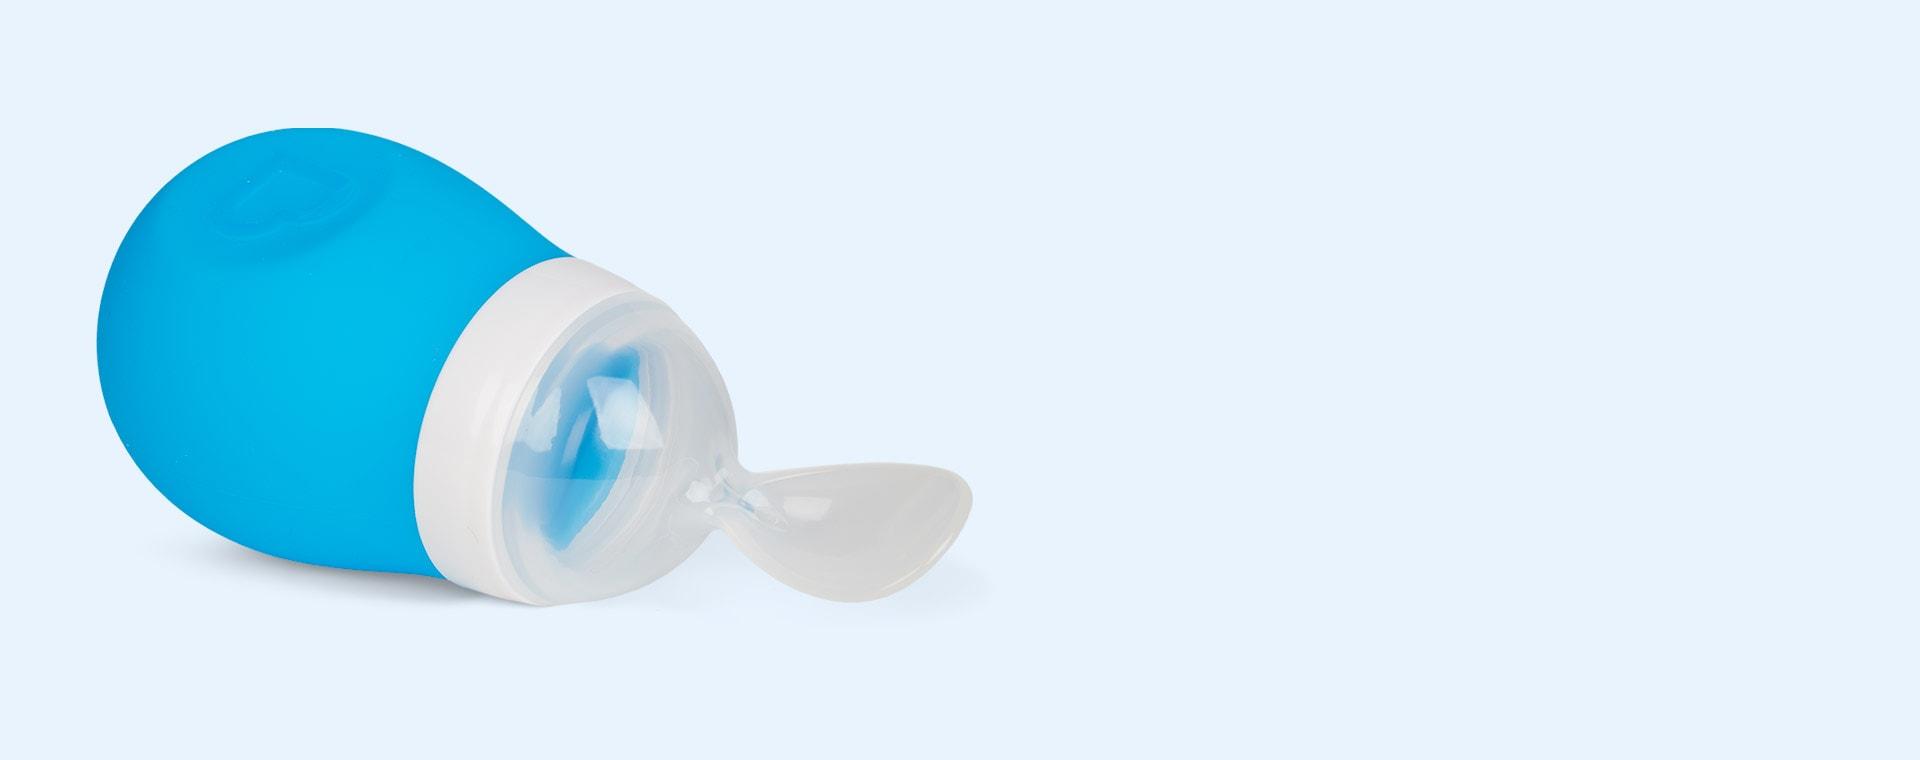 Blue Munchkin Squeeze Spoon